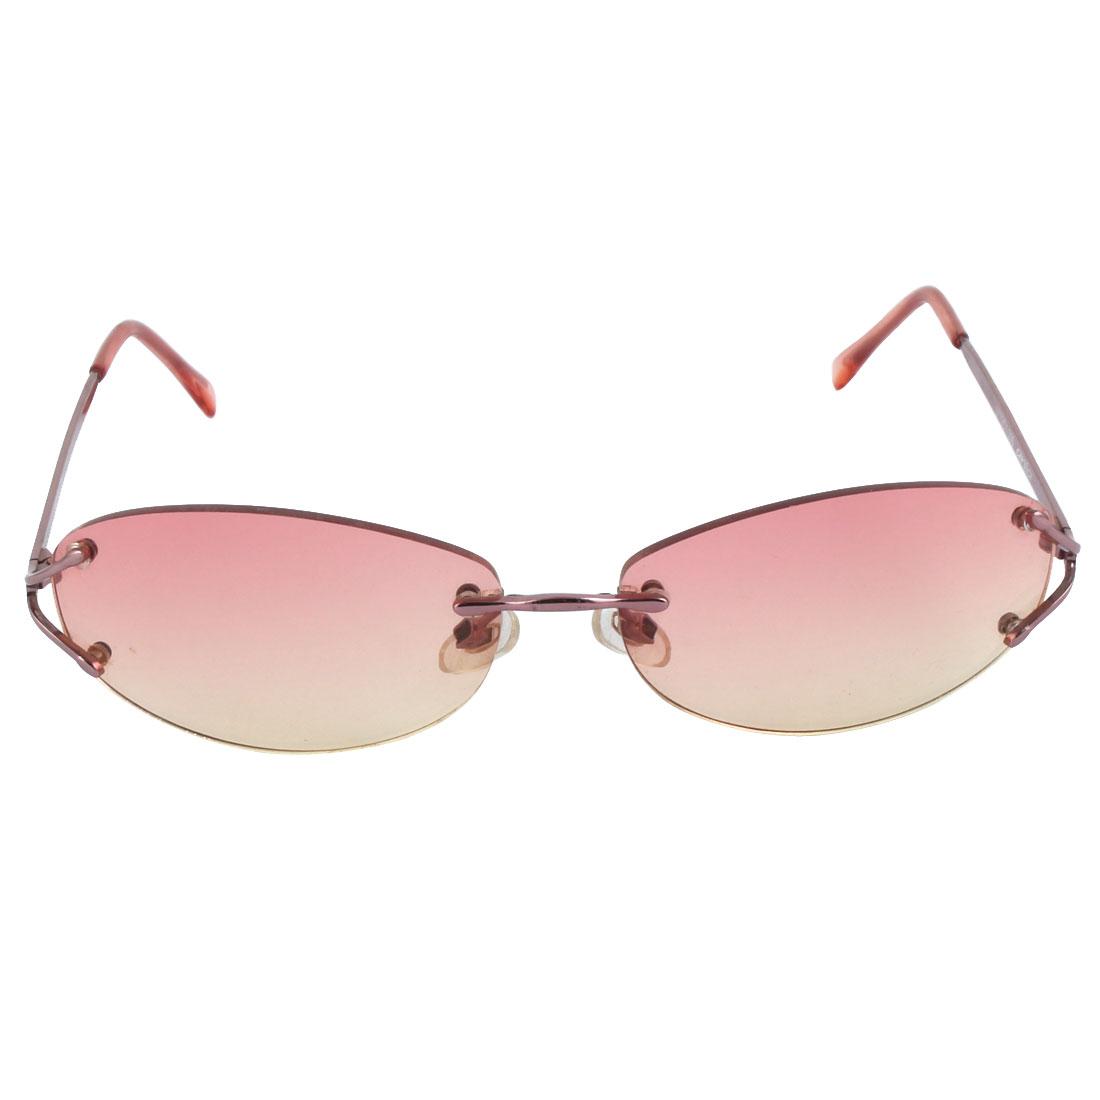 Fashion Oval Lens Slim Metal Frame Lady's Shopping Sunglasses